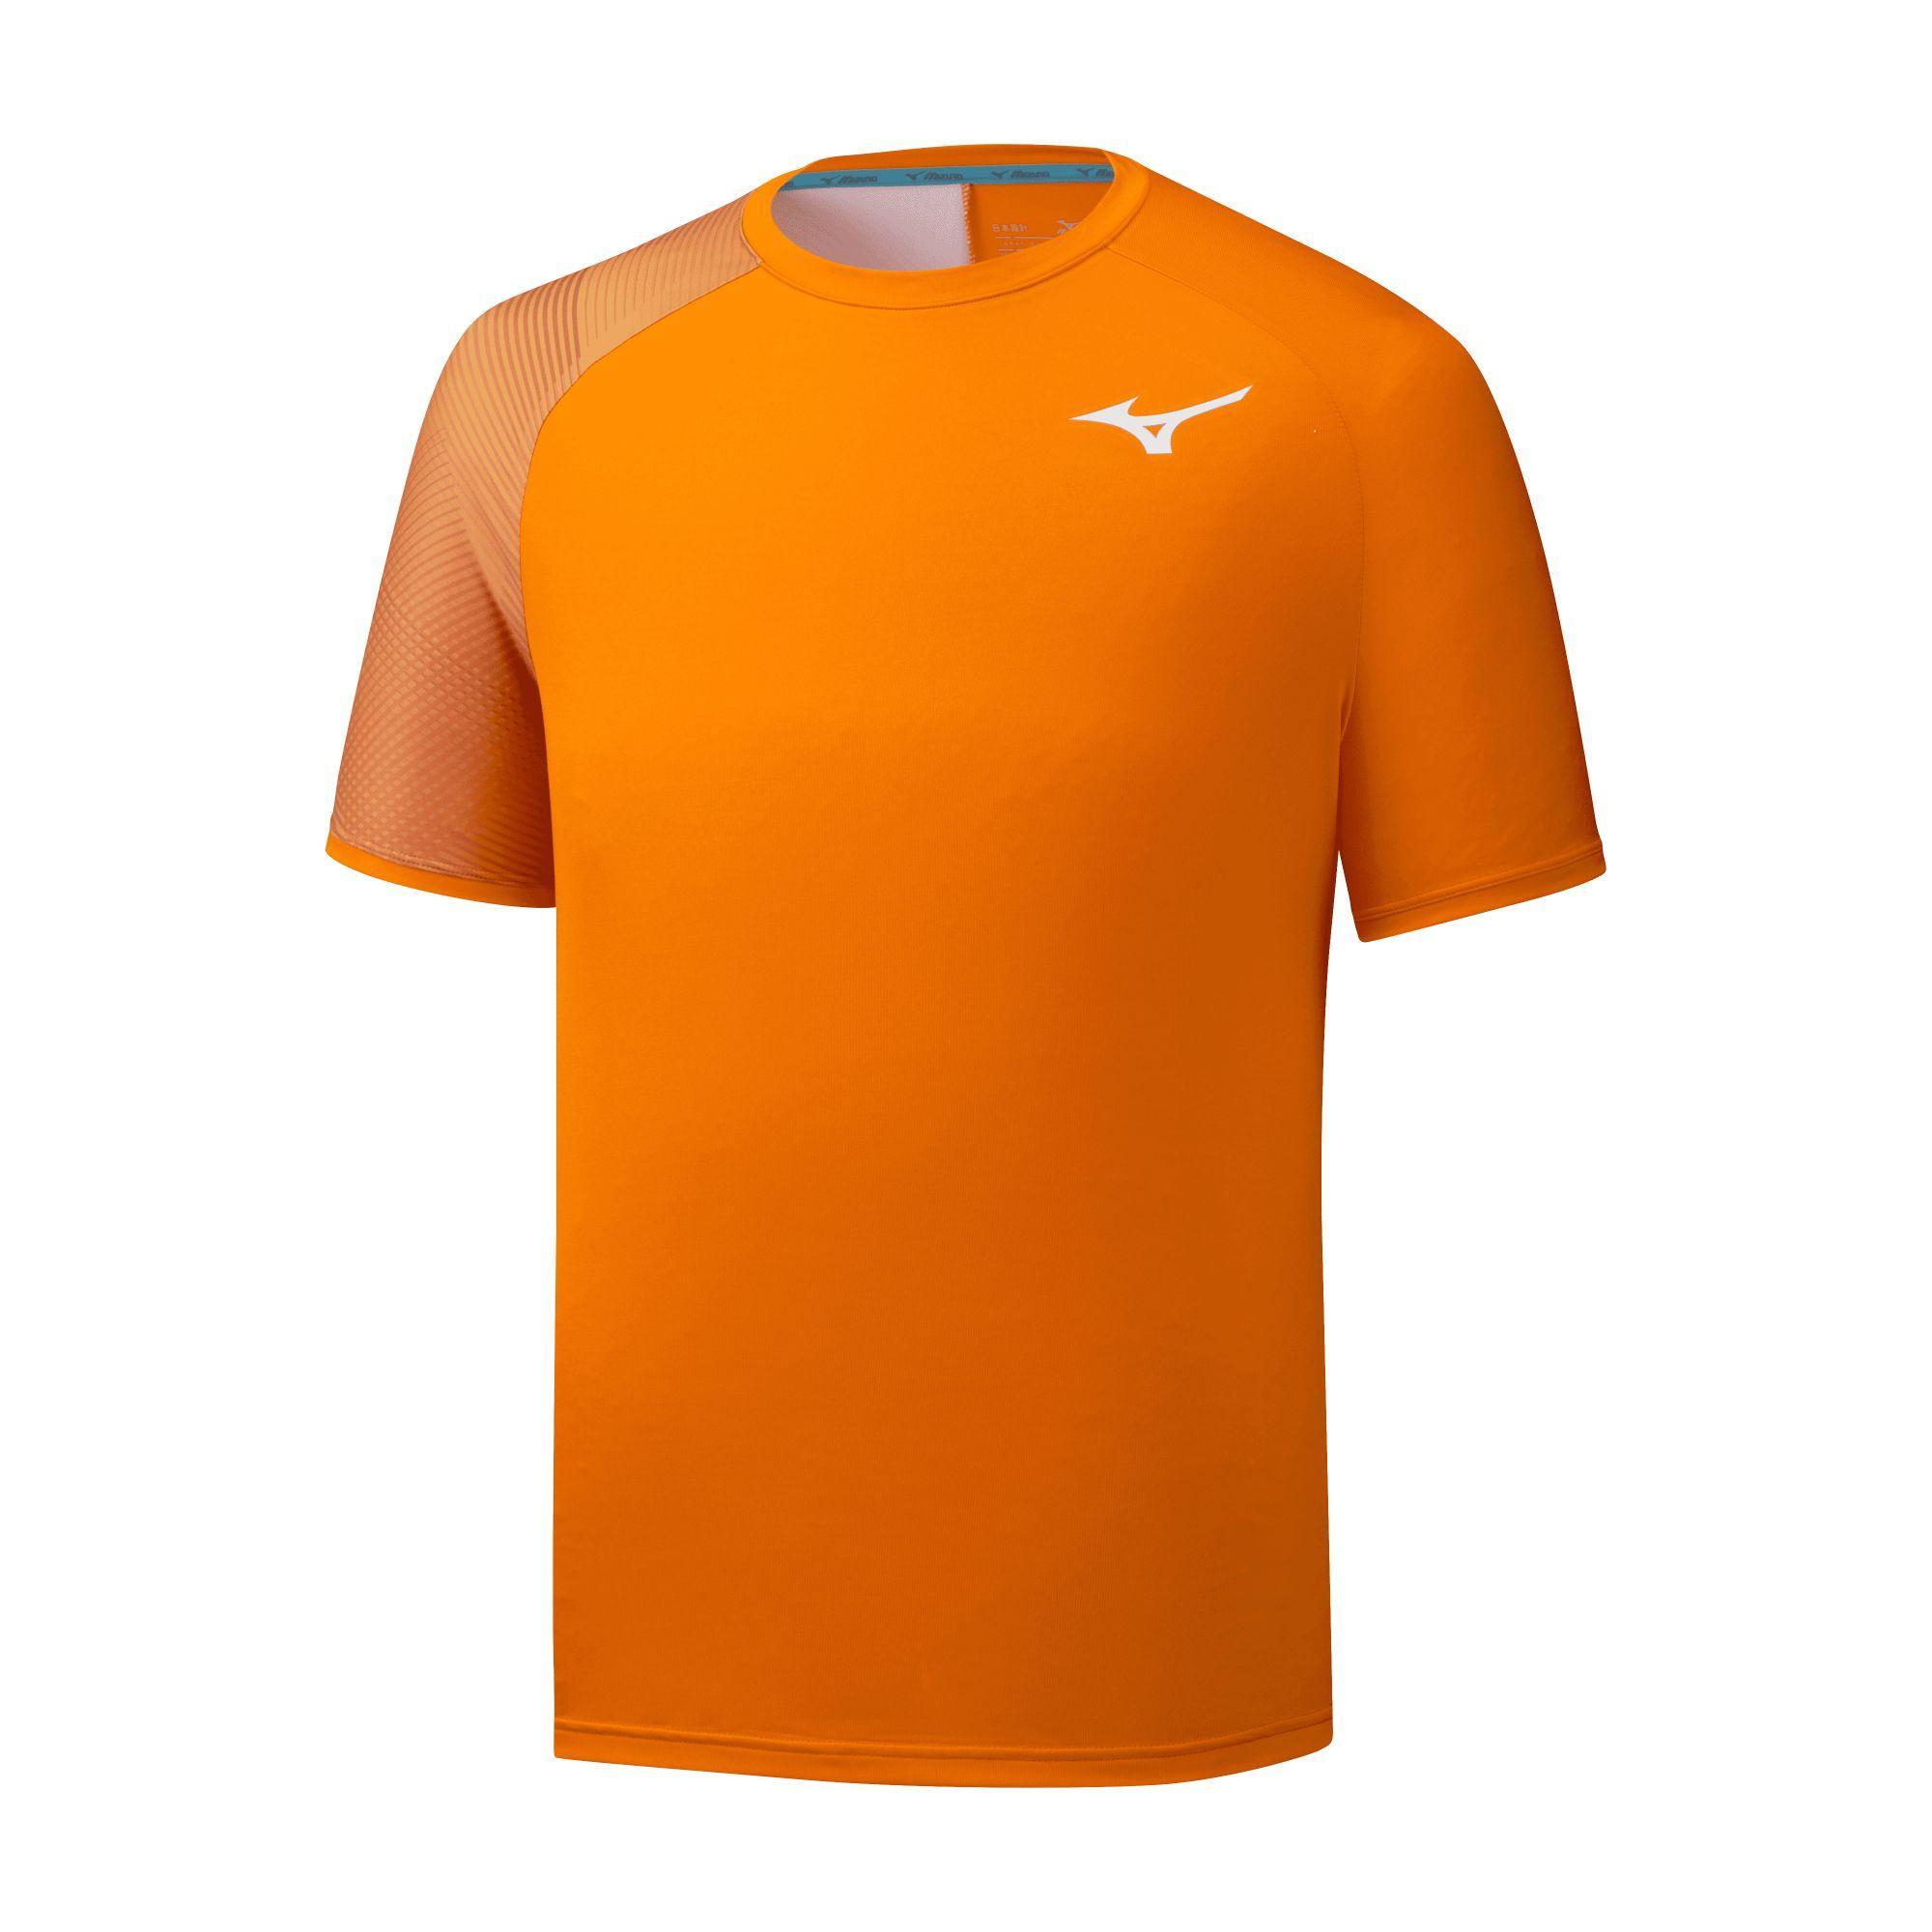 Camiseta Mizuno Shadow naranja